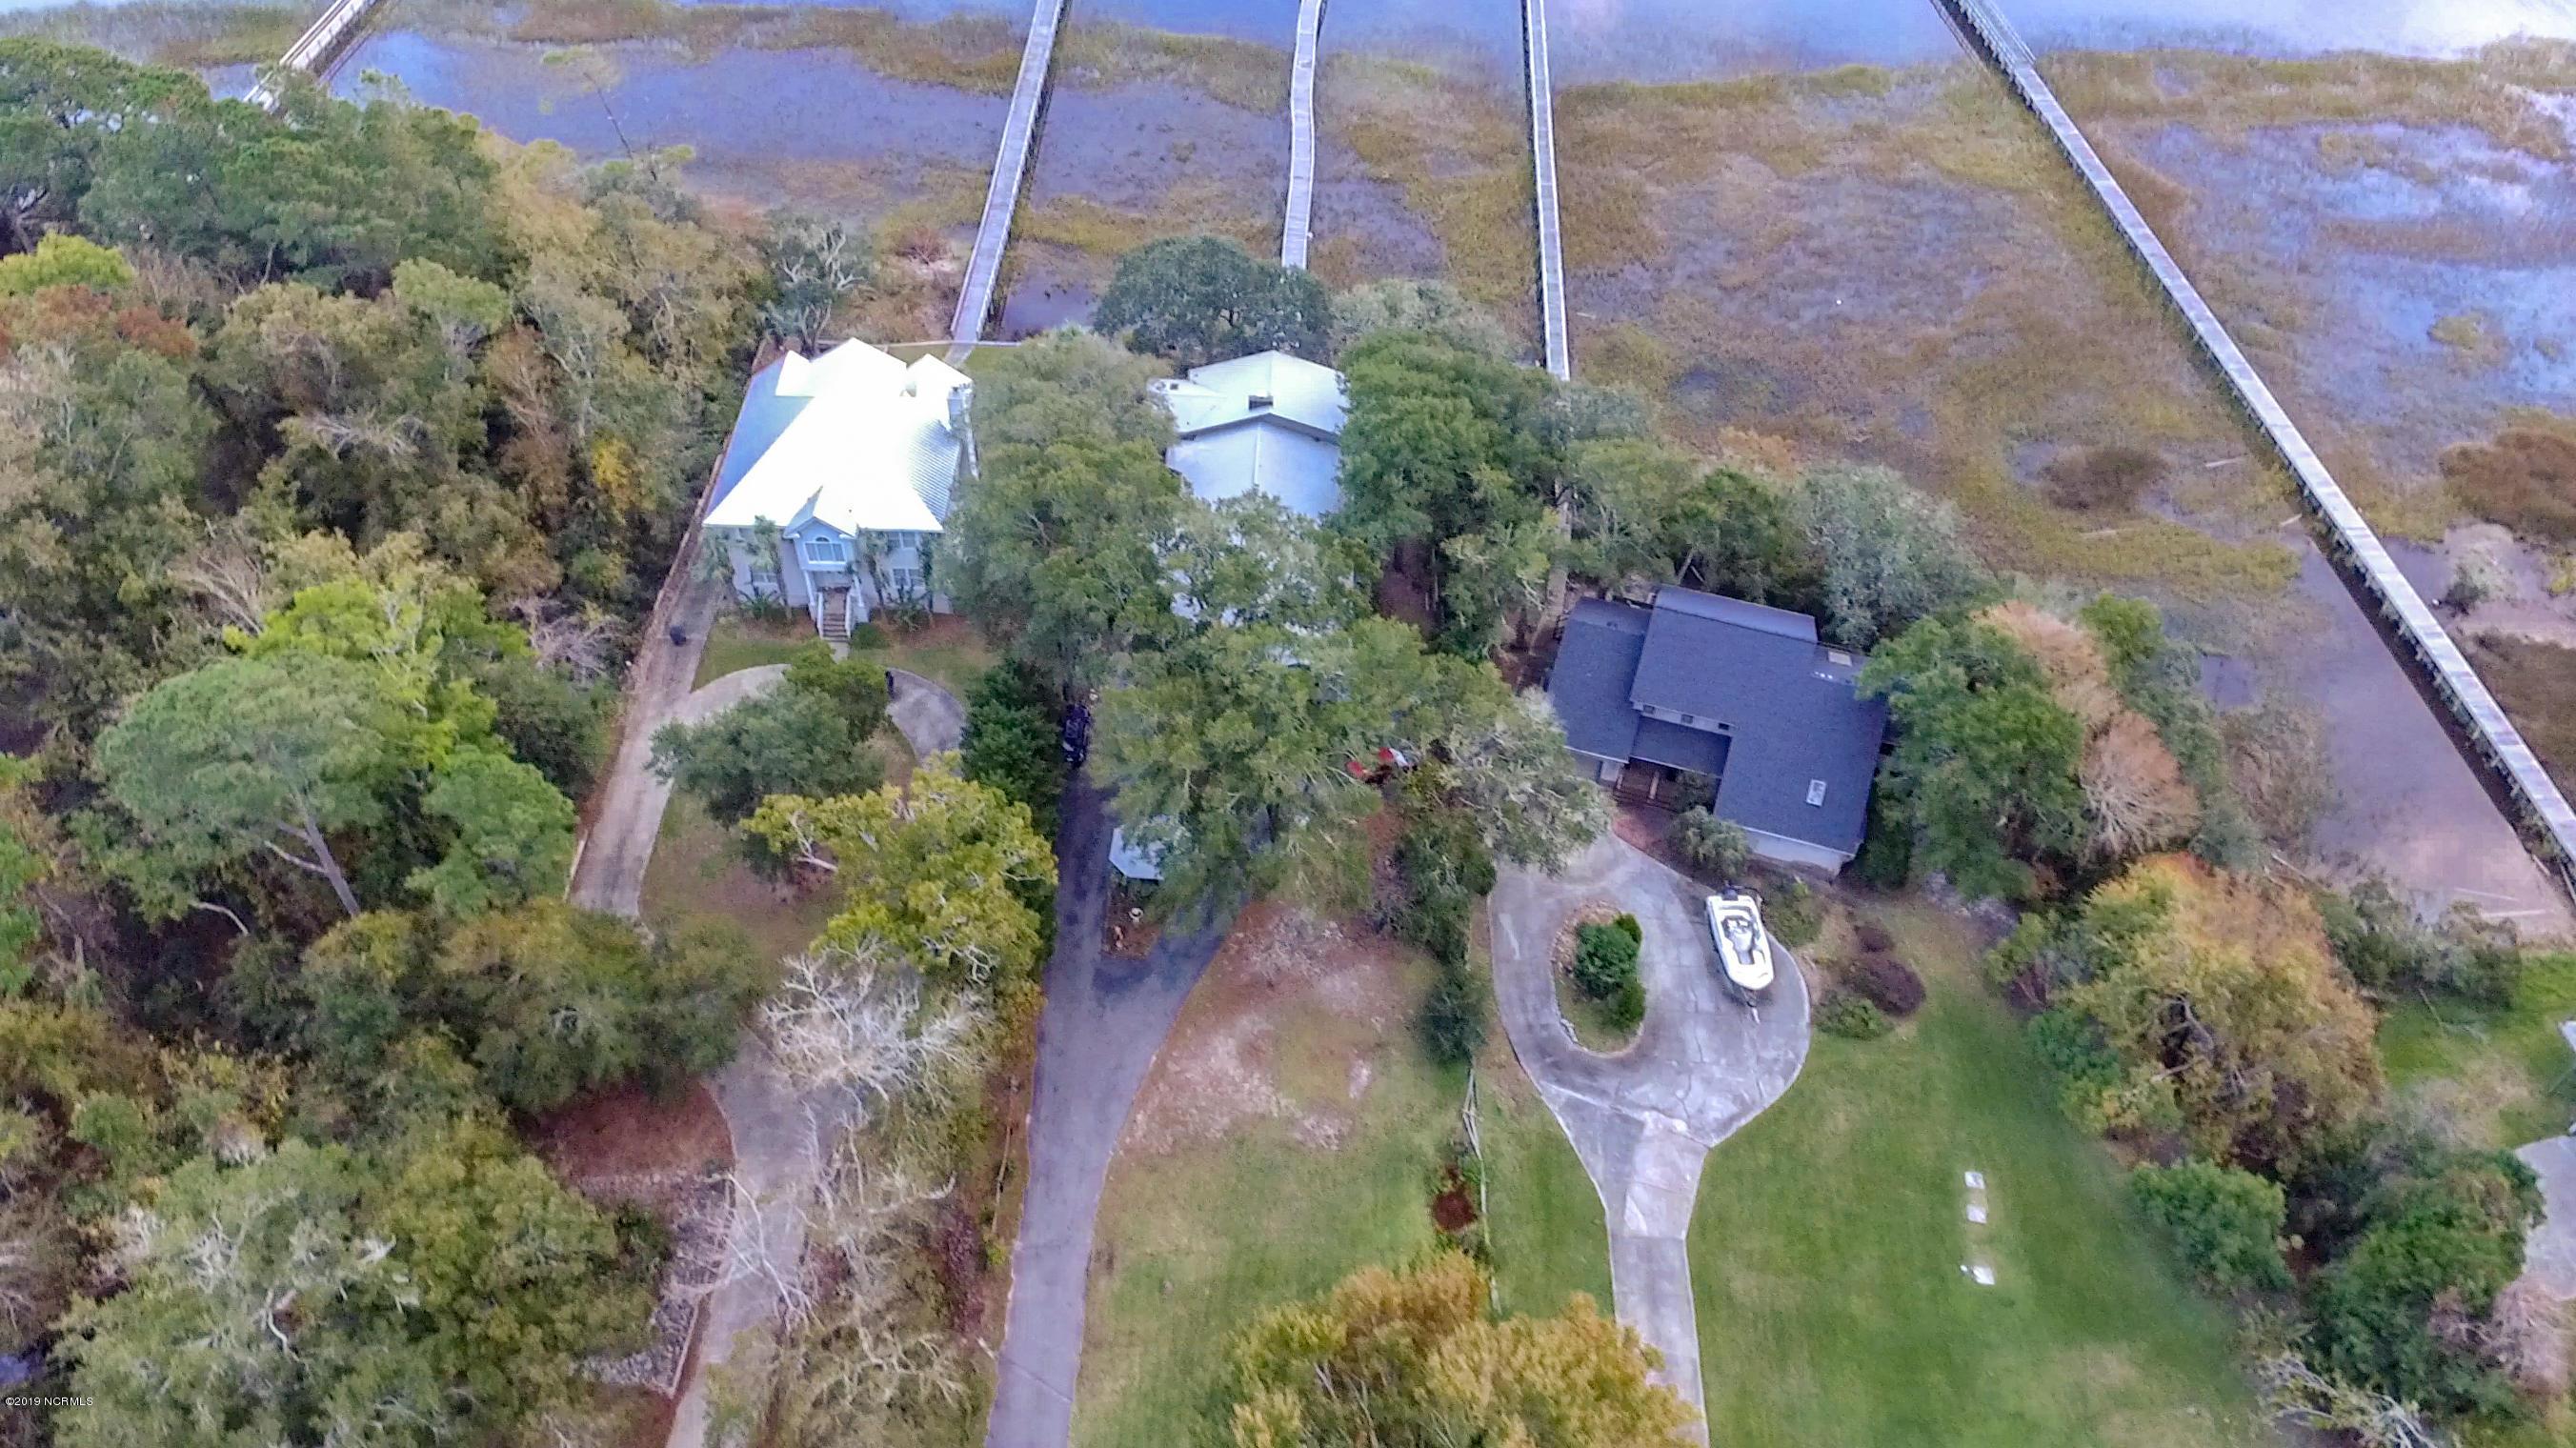 9115 Schuyler Drive, Calabash, North Carolina 28467, 3 Bedrooms Bedrooms, 6 Rooms Rooms,3 BathroomsBathrooms,Single family residence,For sale,Schuyler,100191367